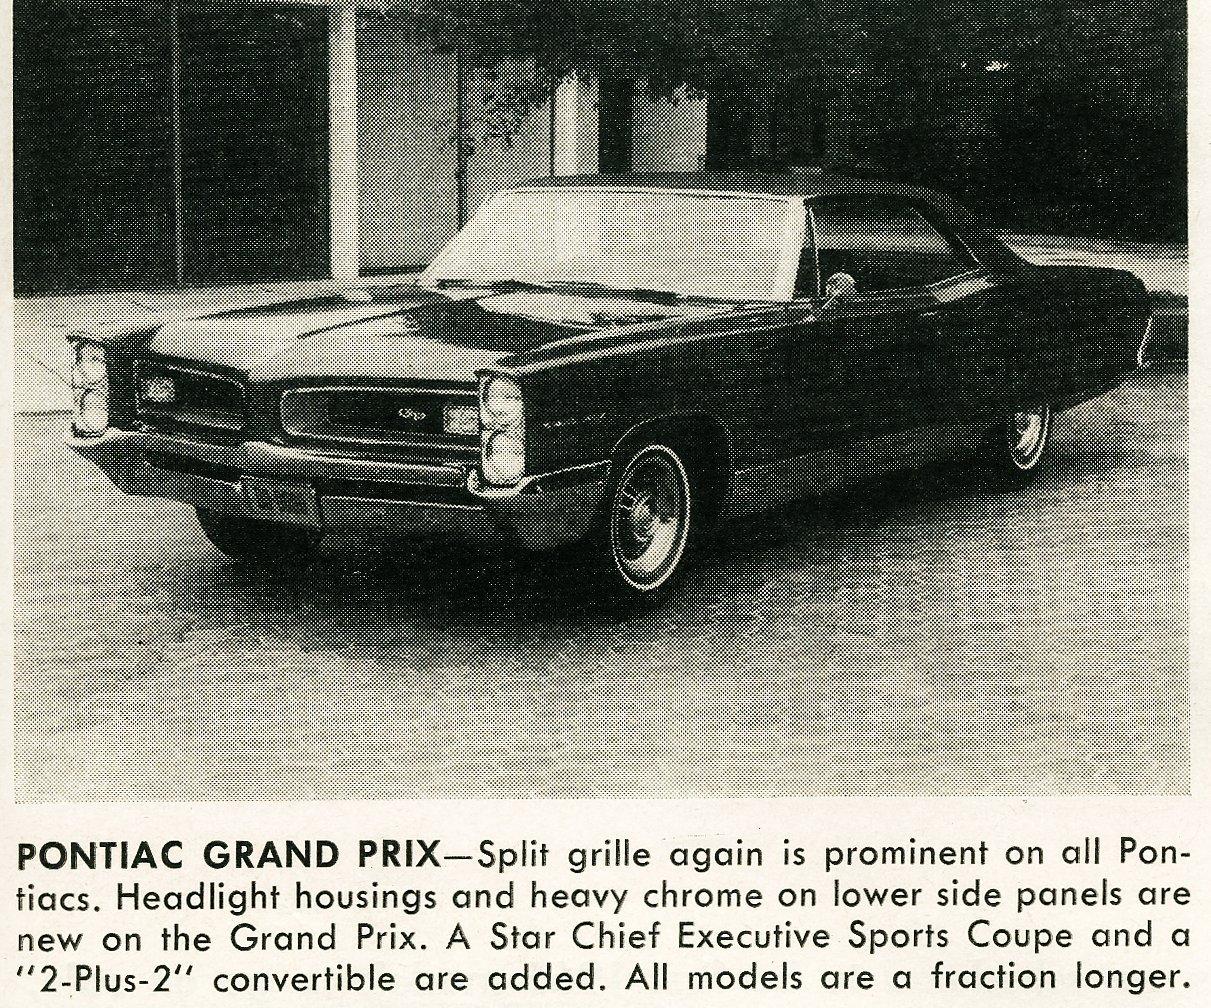 Pontiac Grand Prix -- Vintage cars (1965)